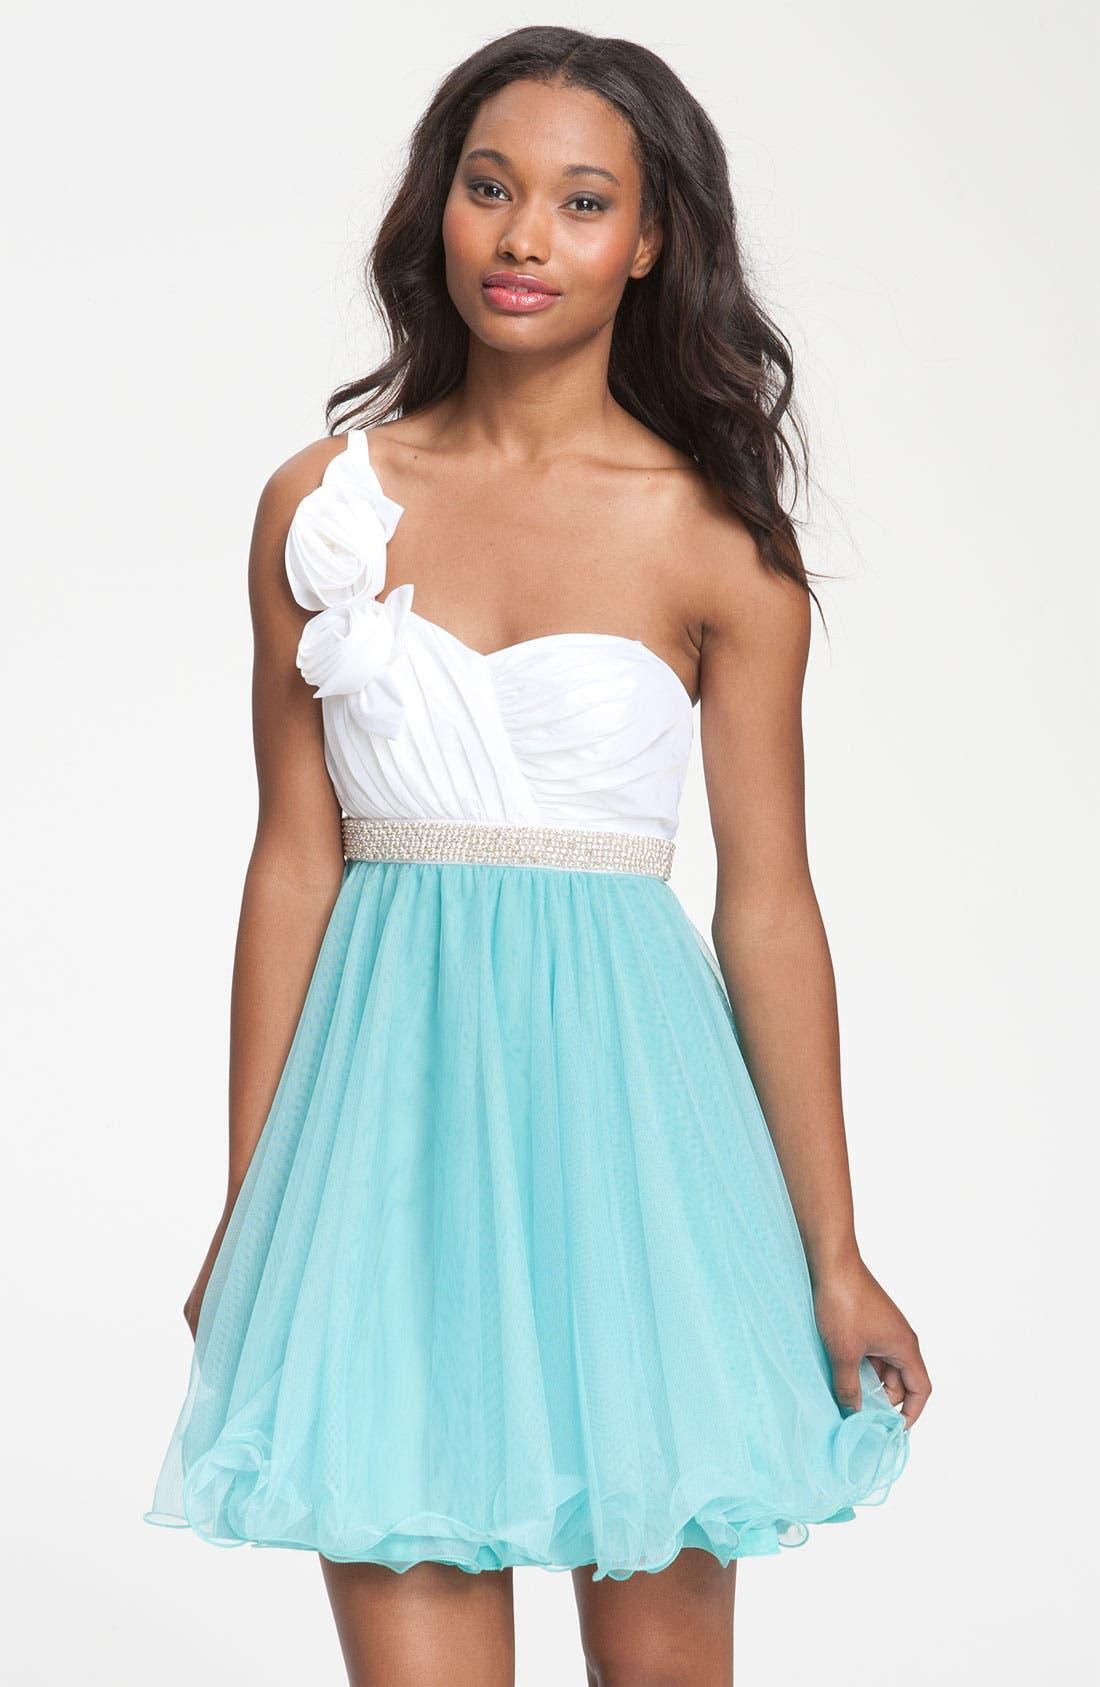 Alternate Image 1 Selected - Way-In One Shoulder Rosette Colorblock Dress (Juniors)